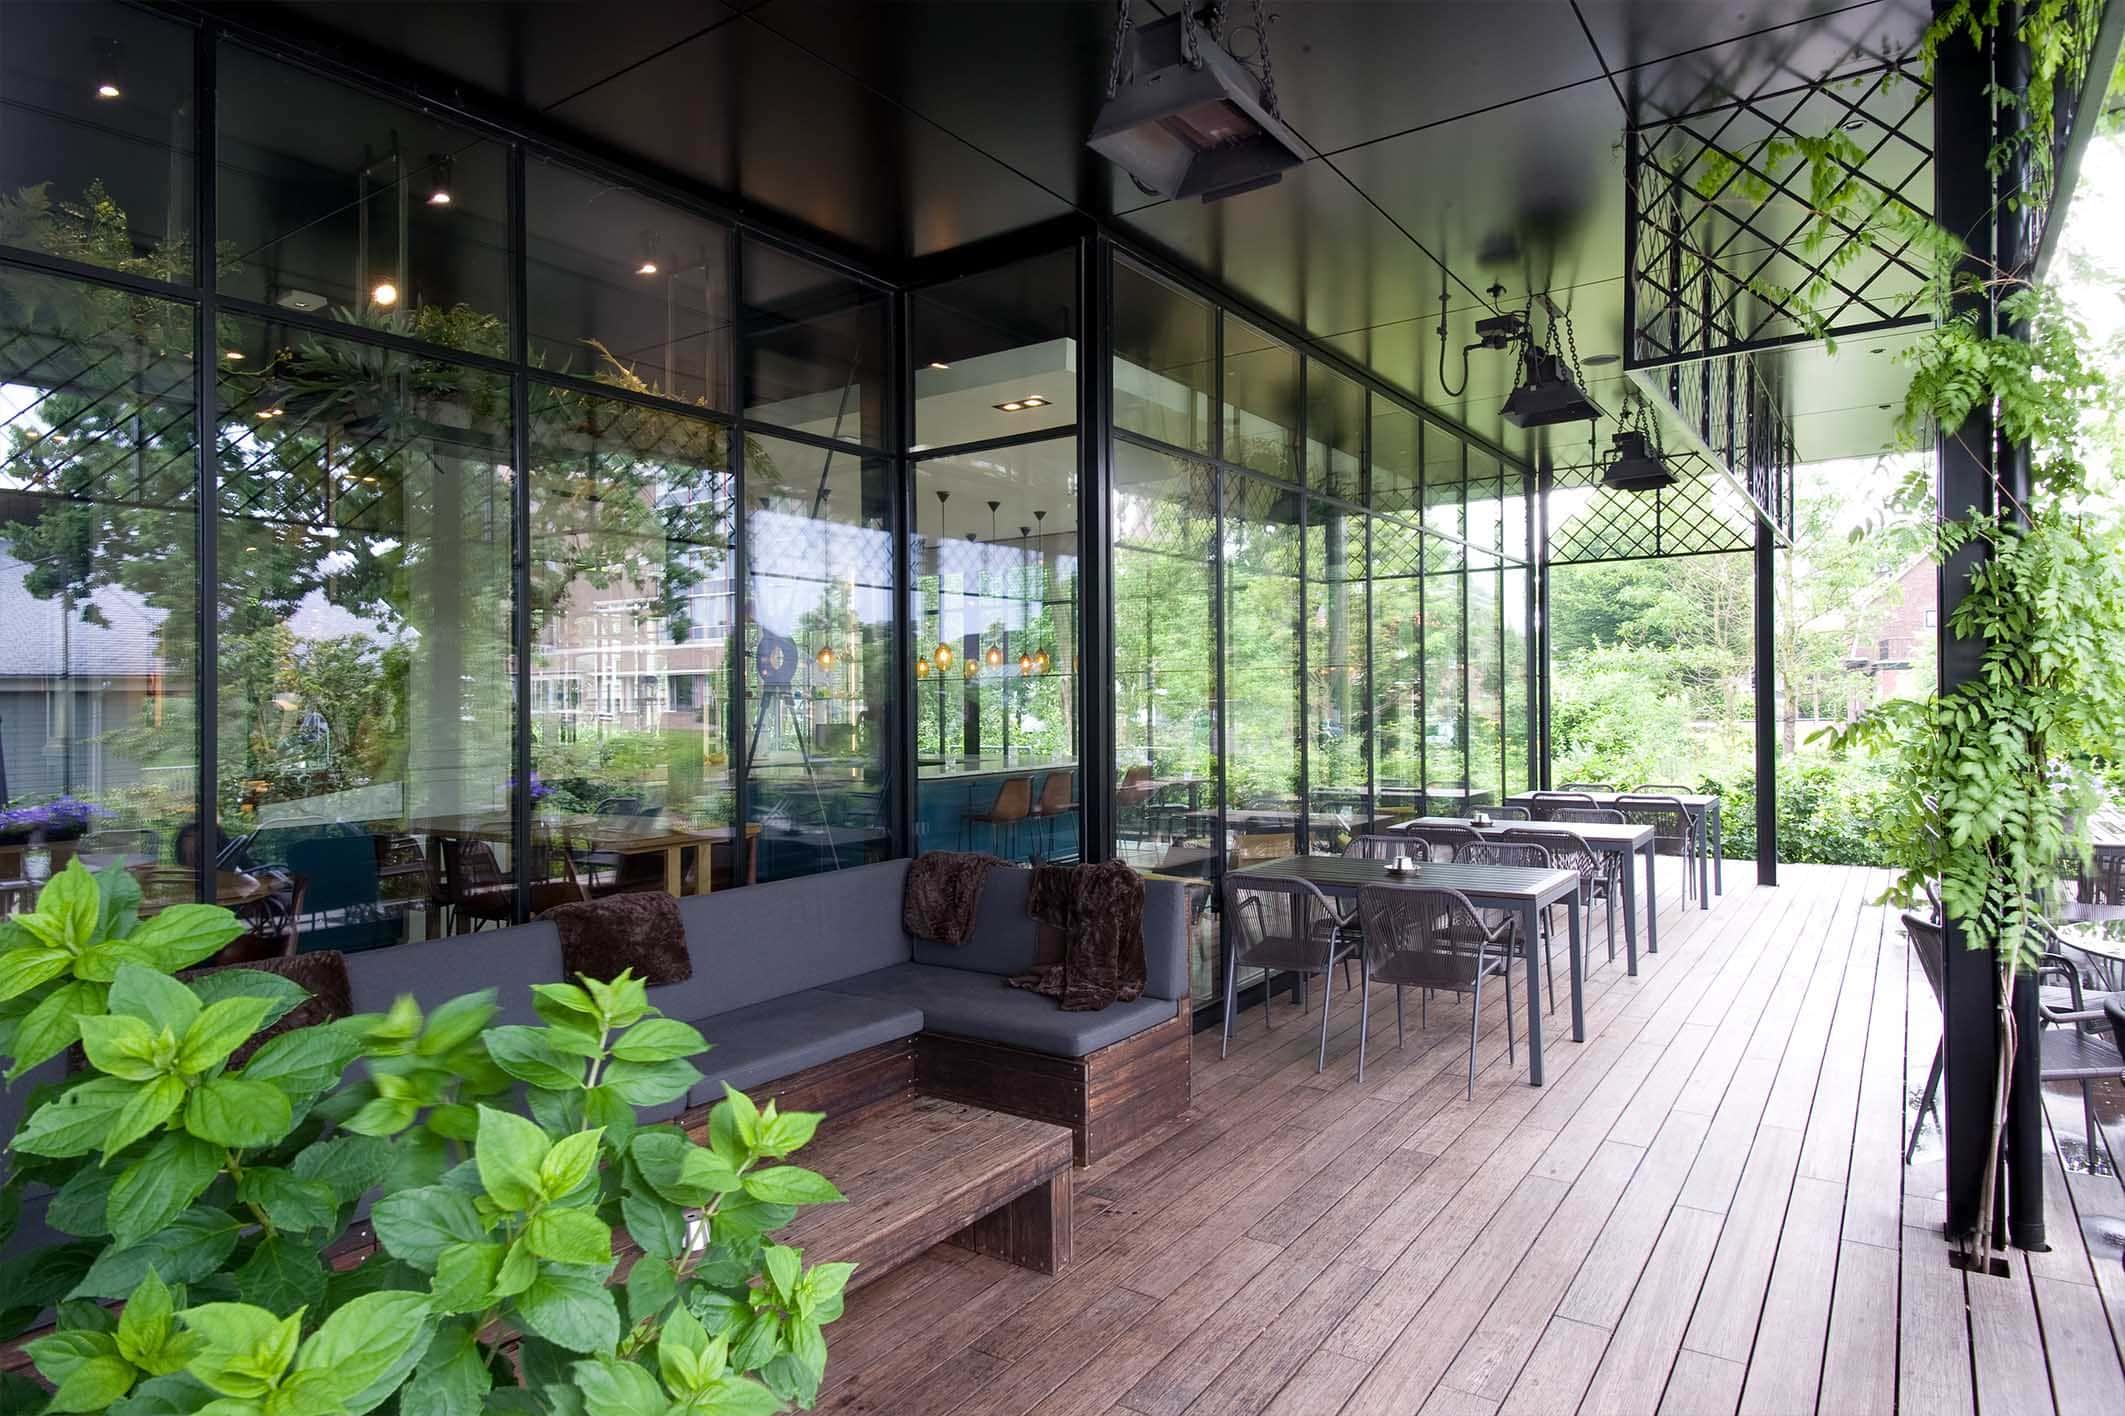 modern restaurant with steel framed glass walls and sliding doors